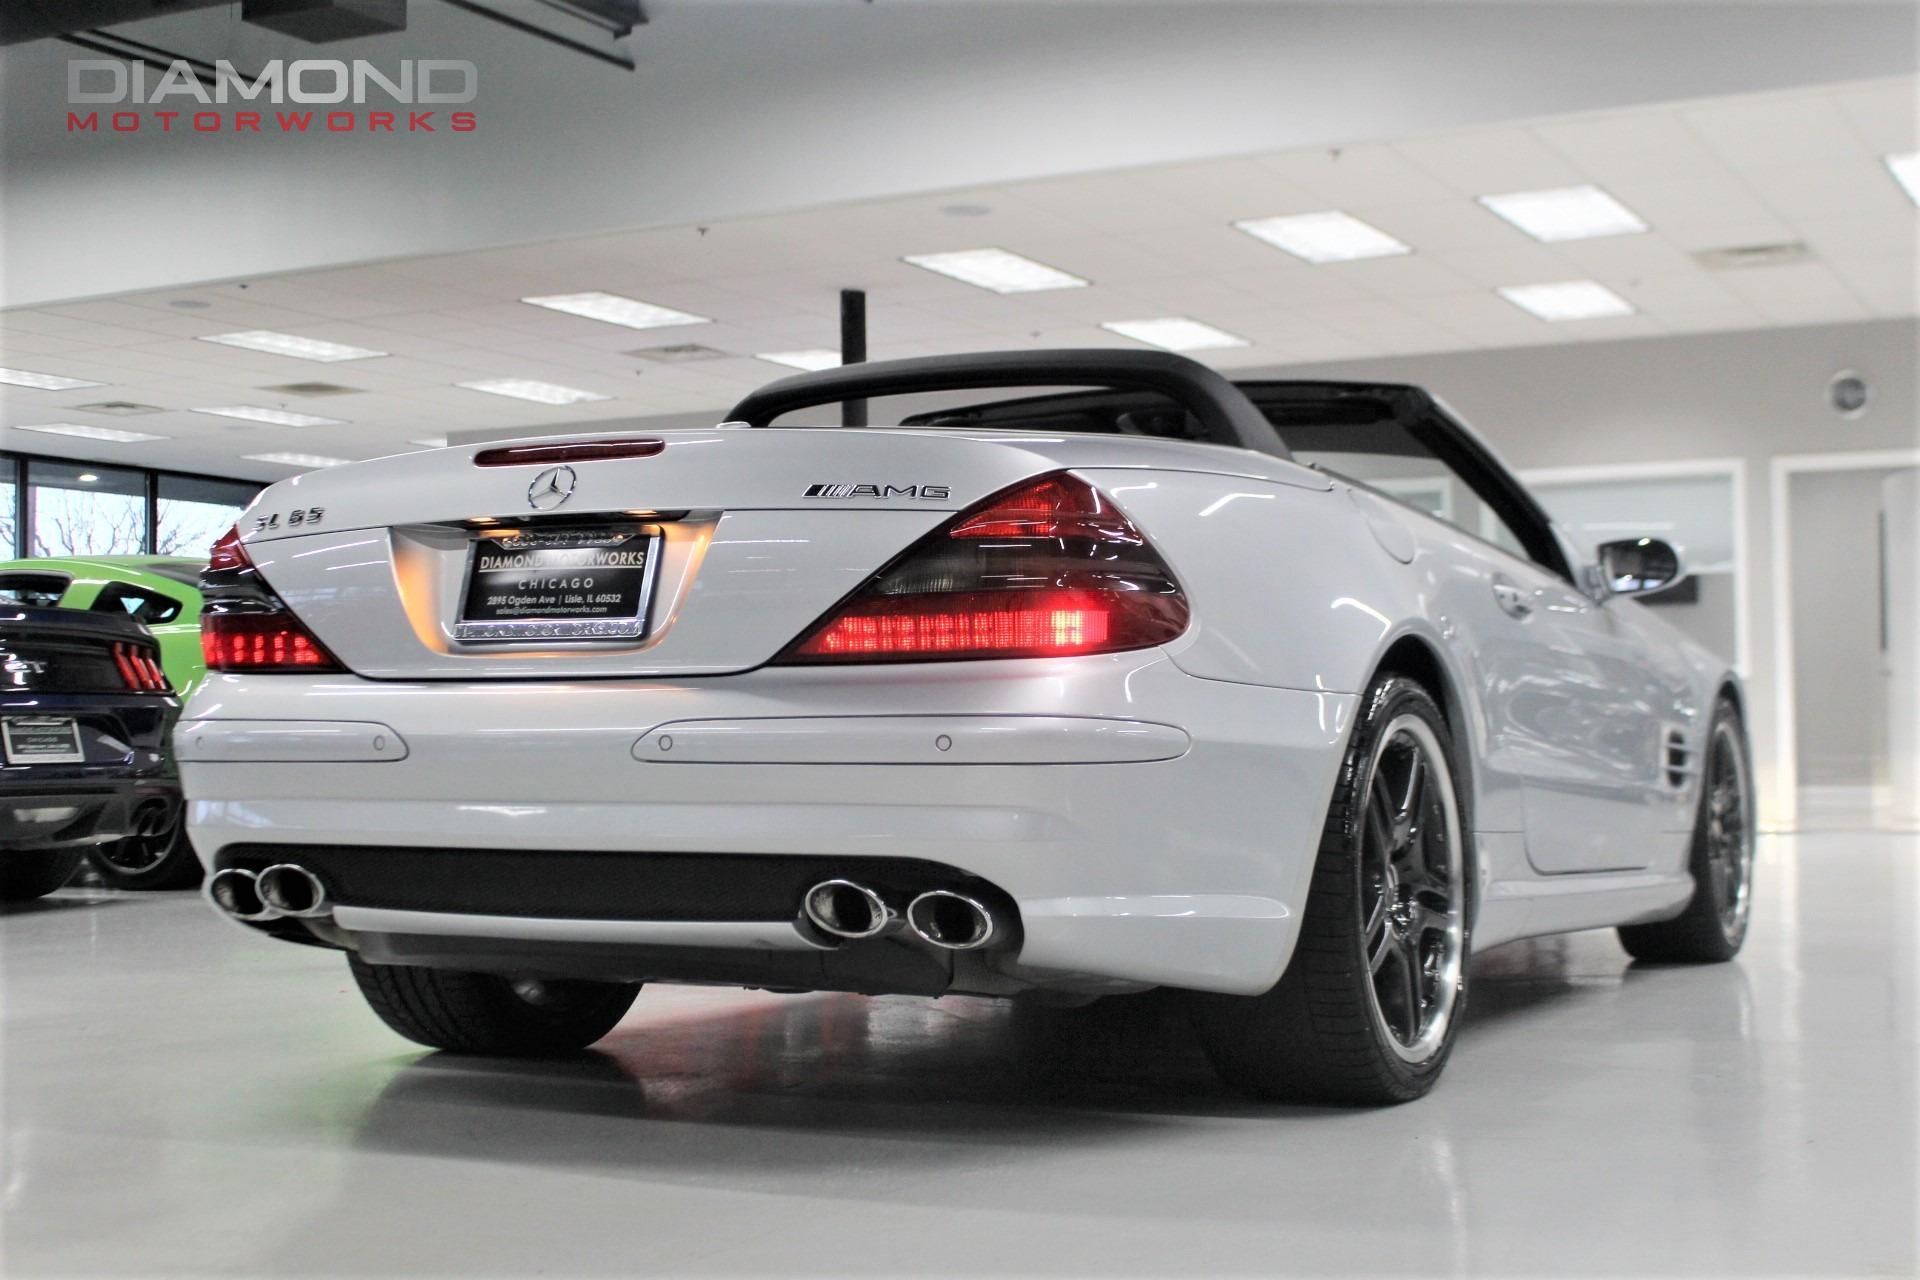 Used-2006-Mercedes-Benz-SL-Class-SL-65-AMG